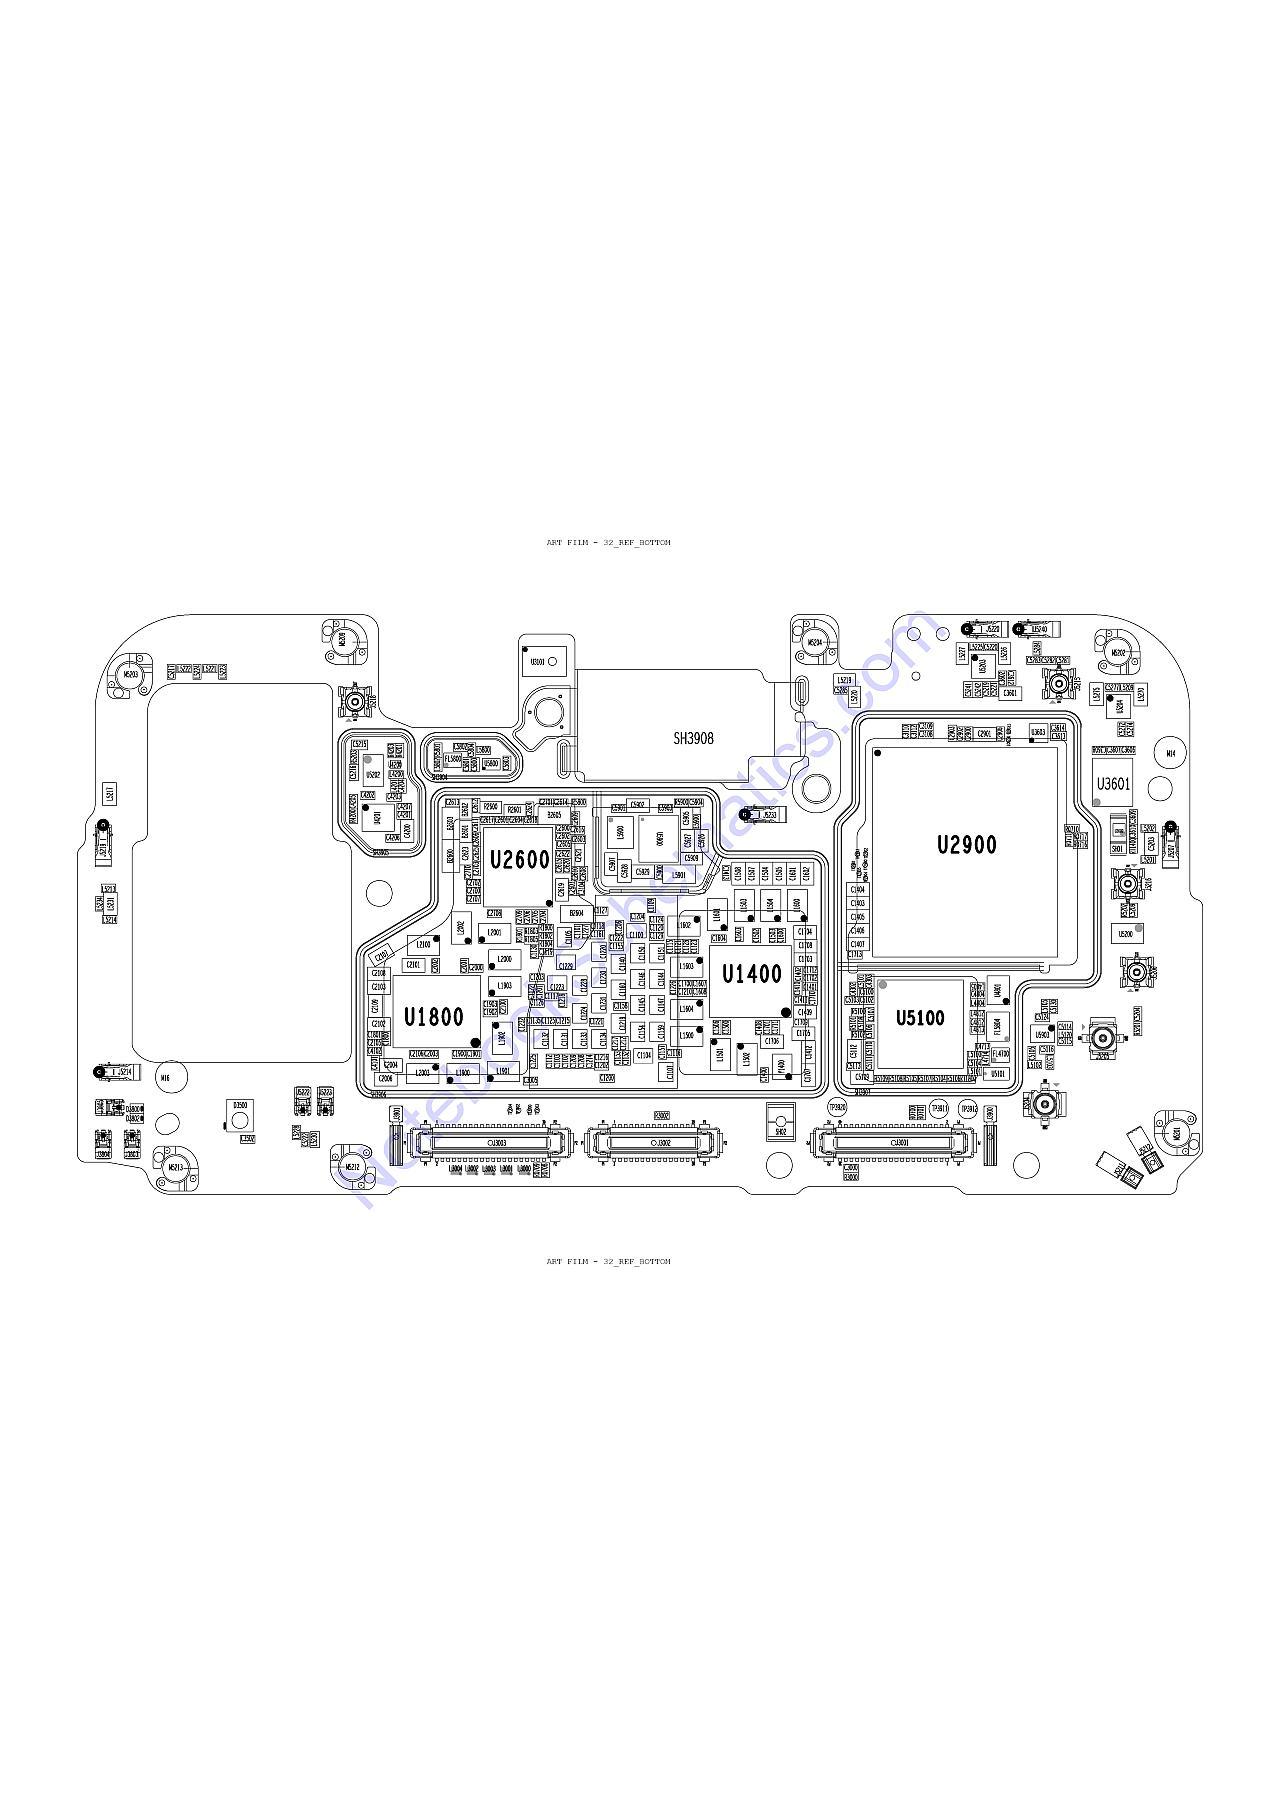 Xiaomi Black Shark 2 Schematic Amp Pcb Layout